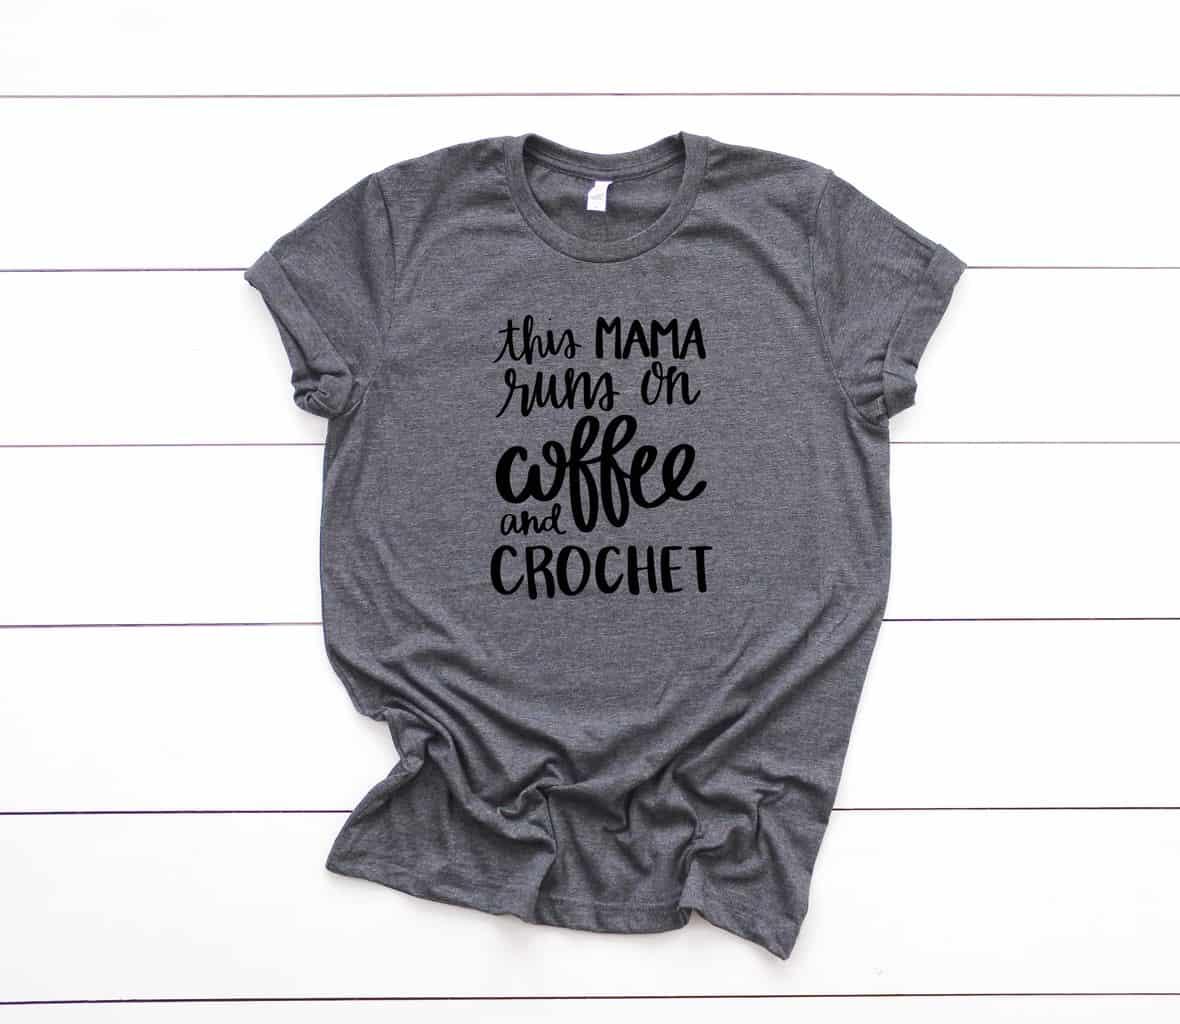 Crochet T-Shirts